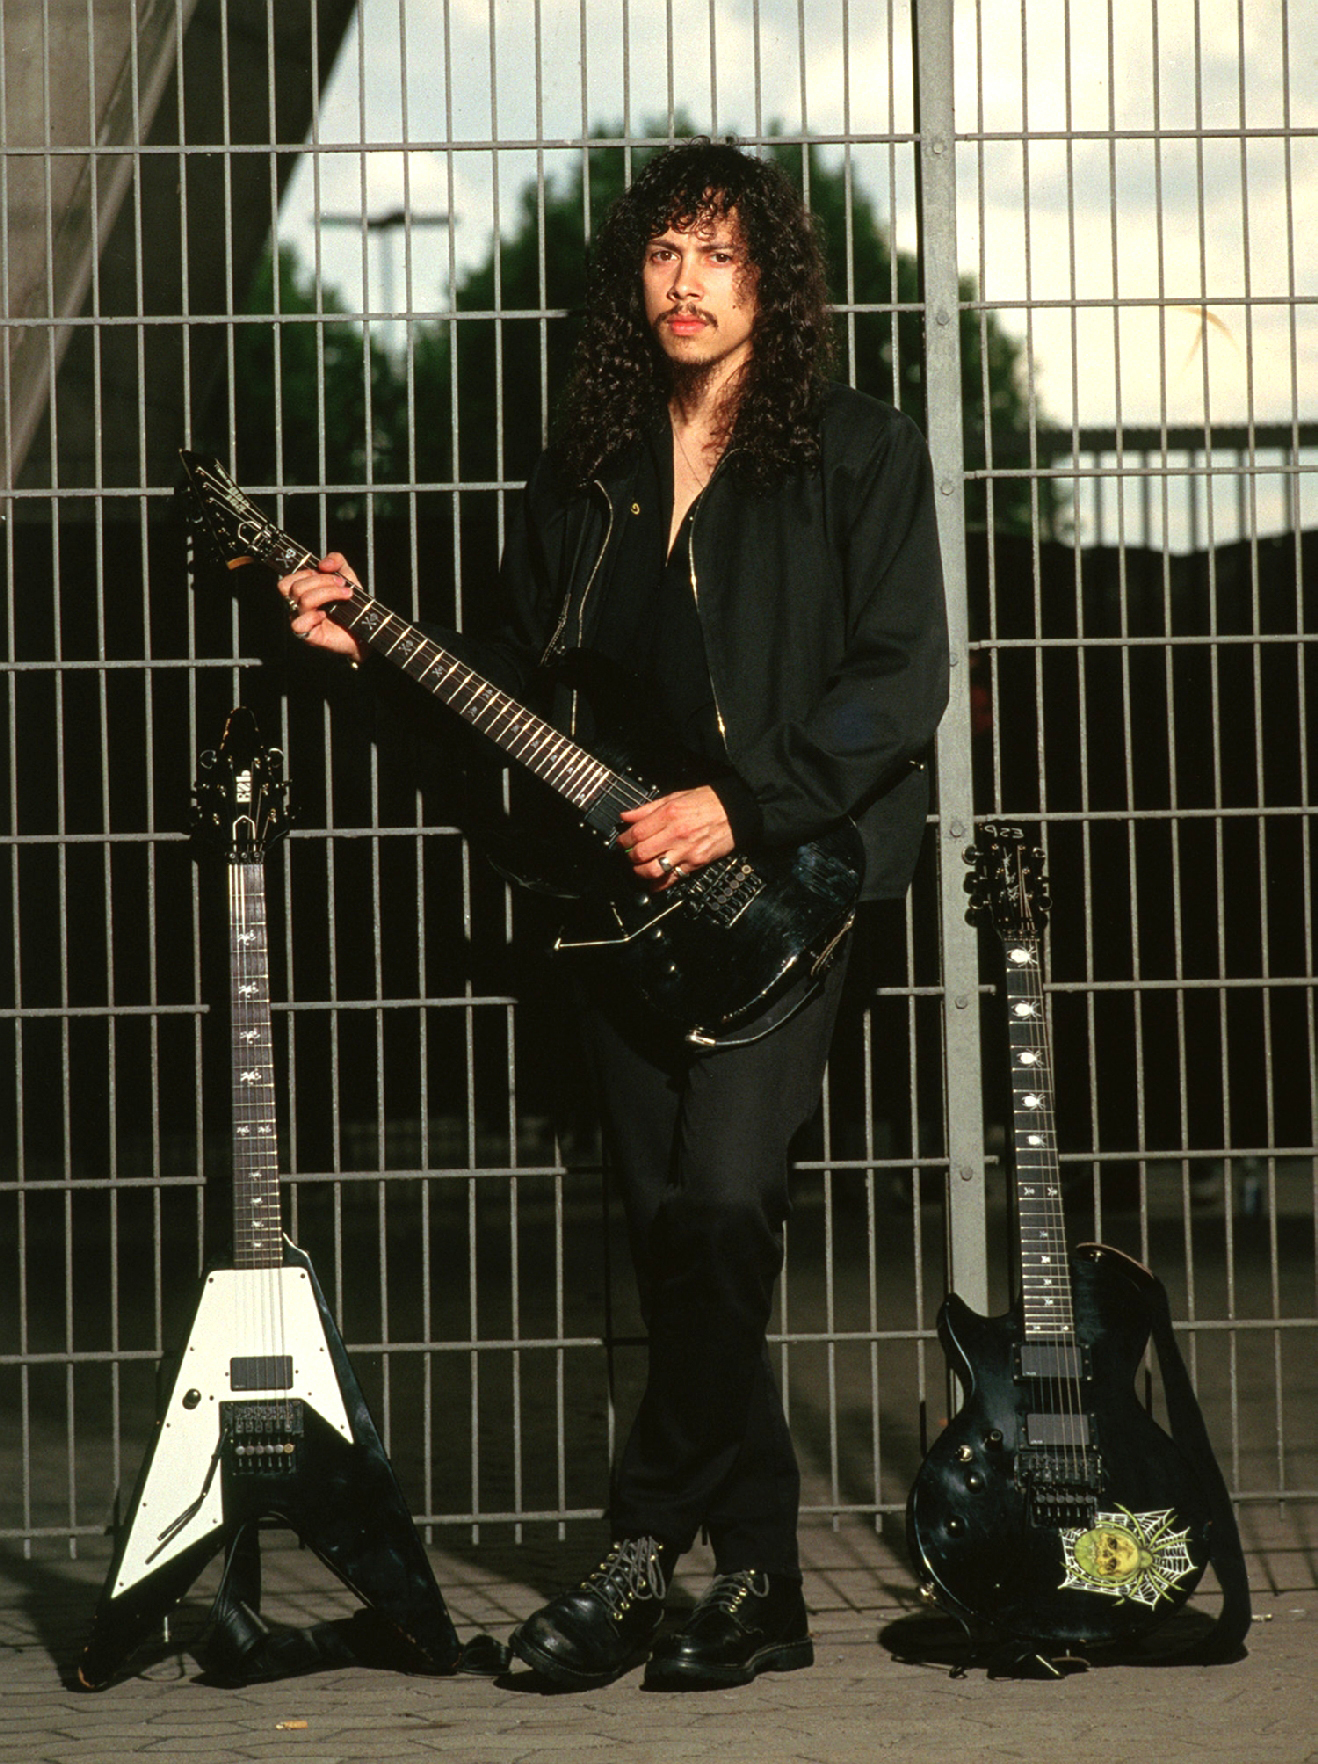 Kirk Kirk Hammett Photo 20396716 Fanpop